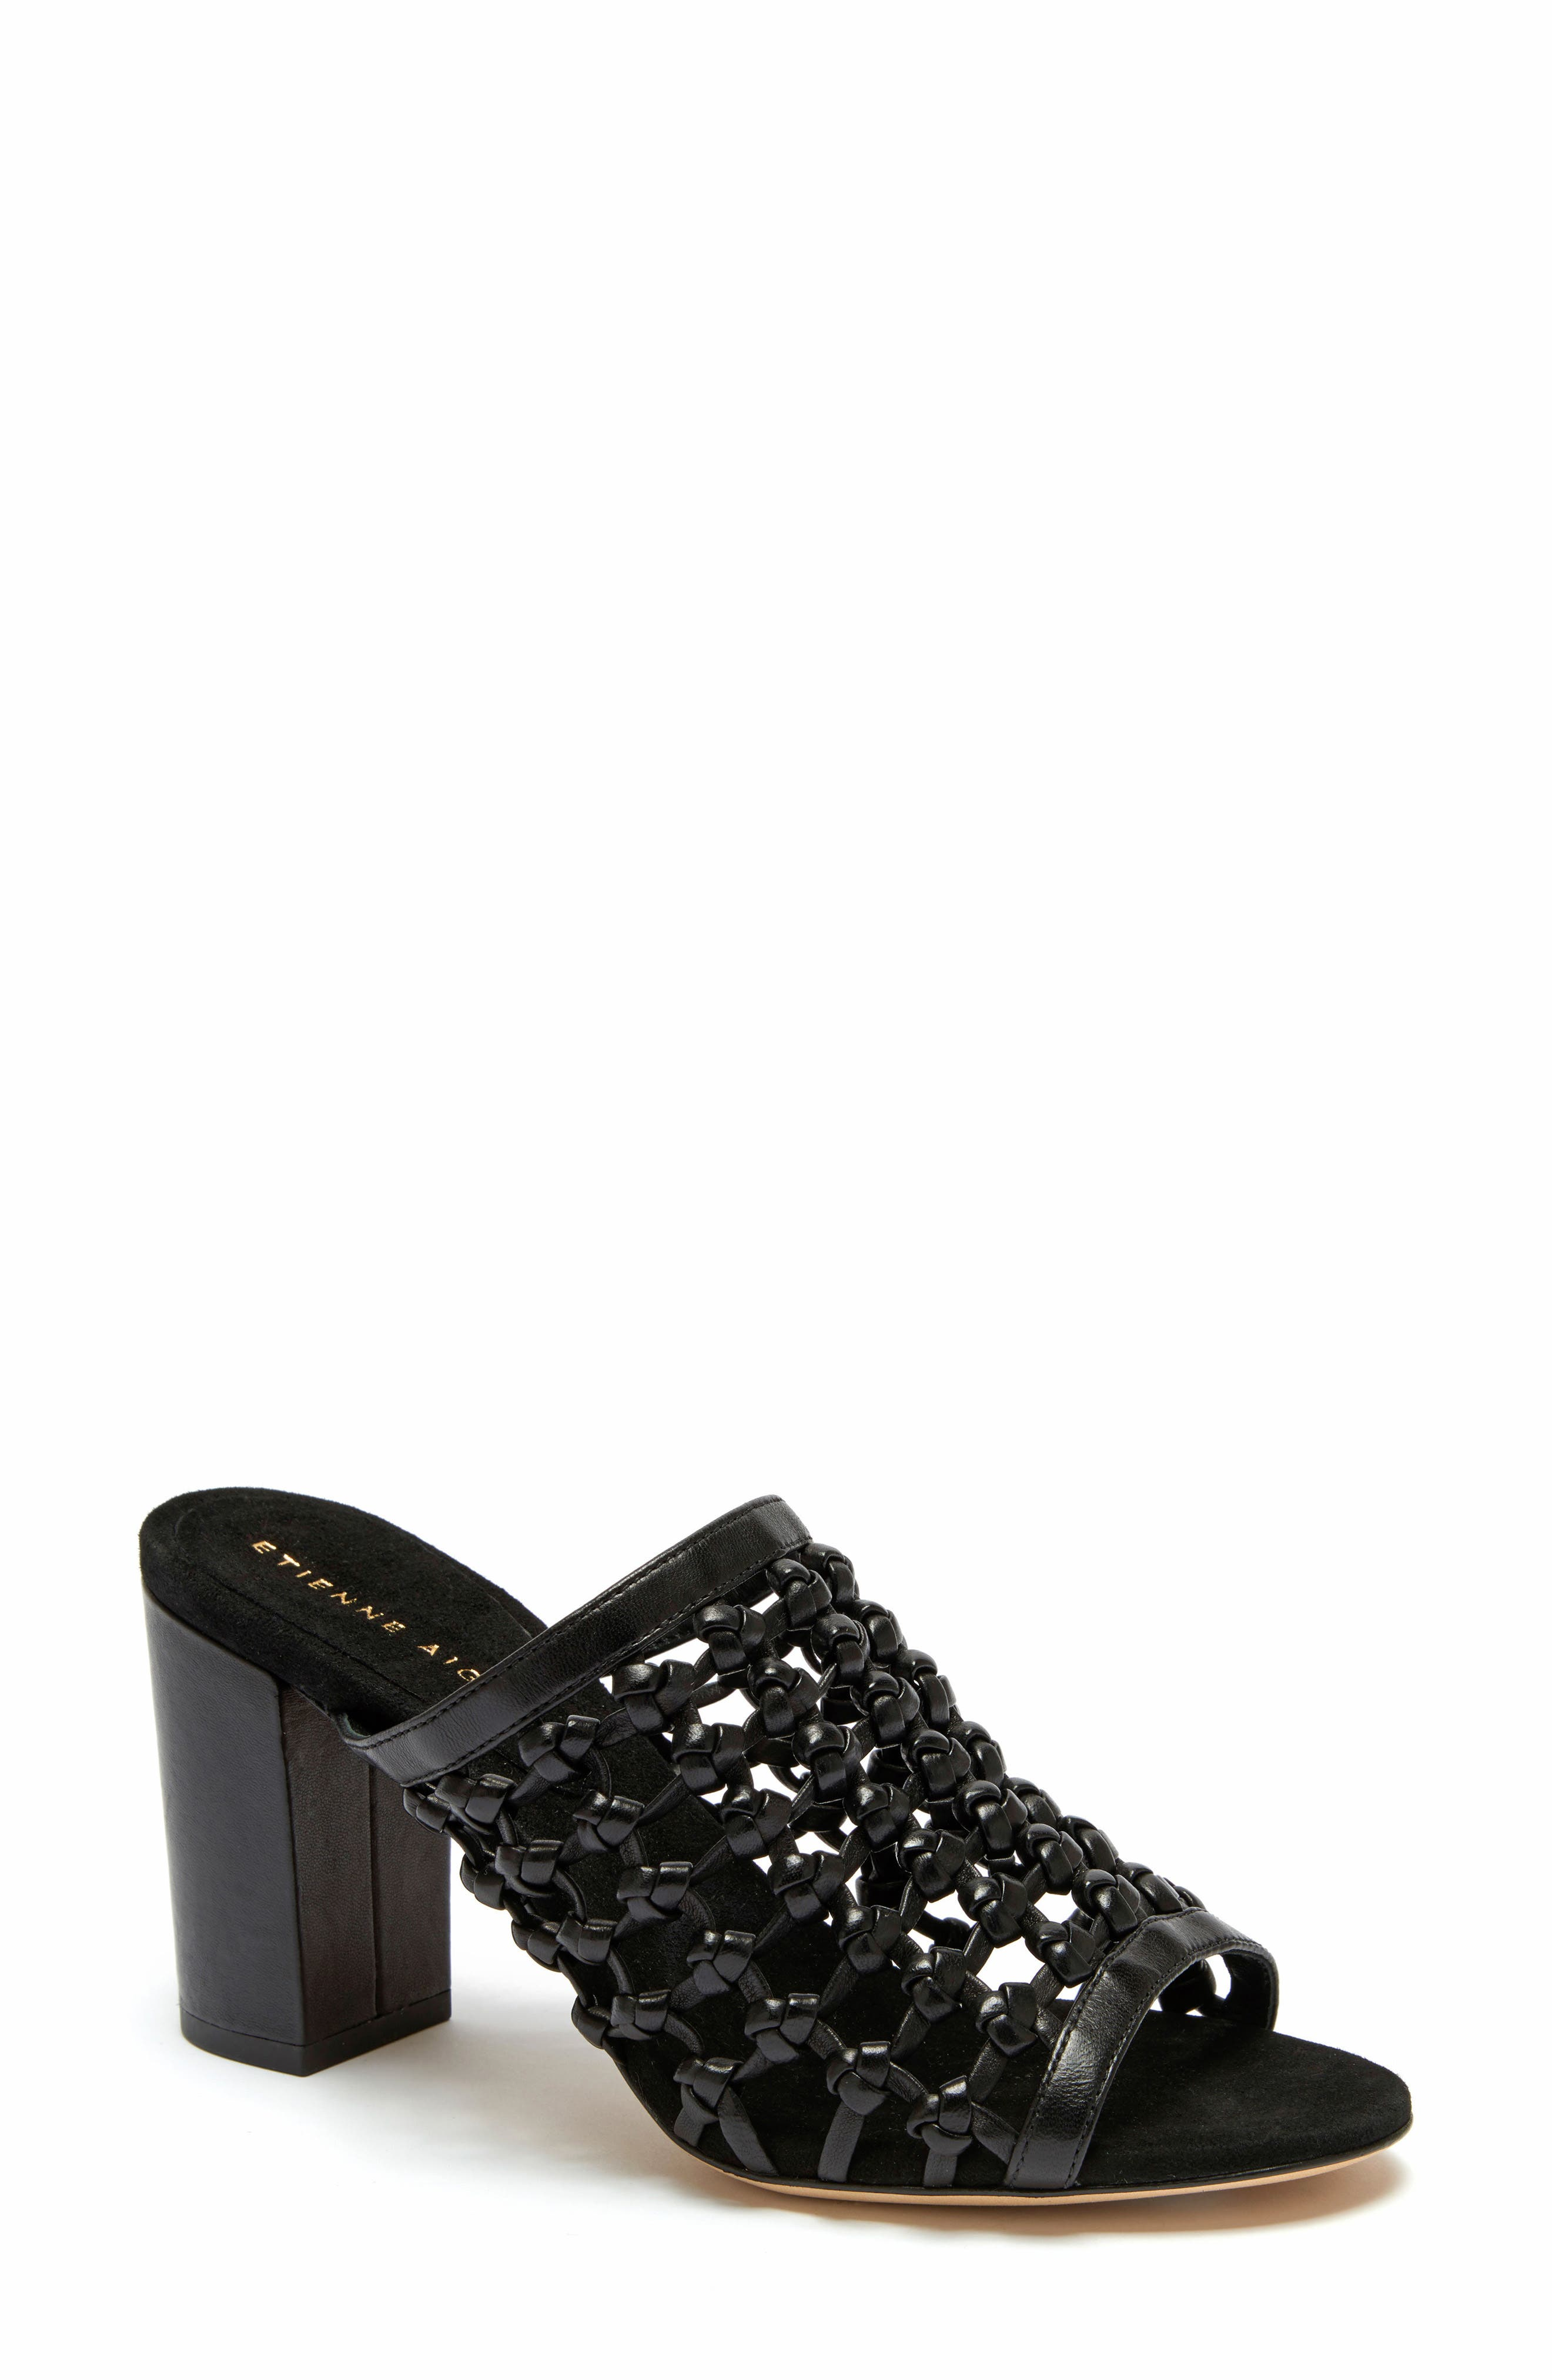 Lanai Sandal,                         Main,                         color, BLACK LEATHER